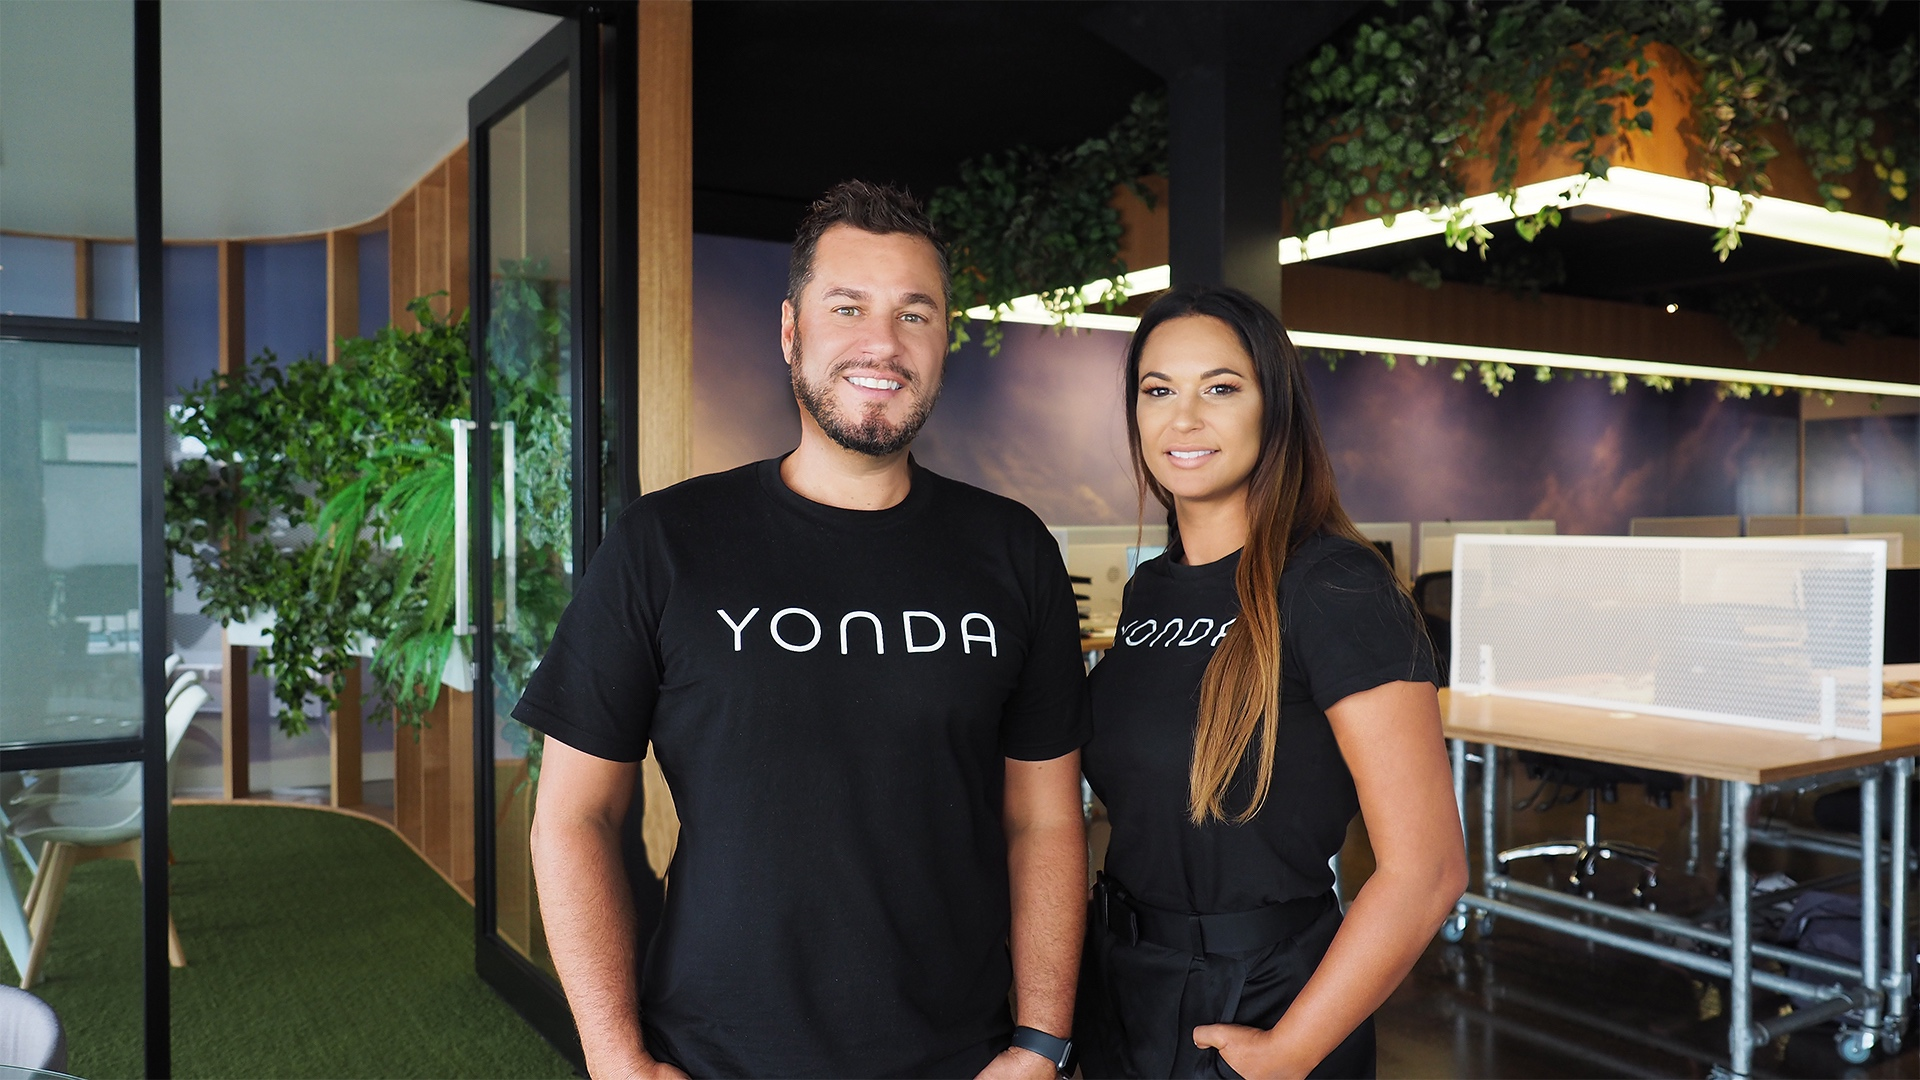 YONDA® Reveals New Home in Mermaid Beach